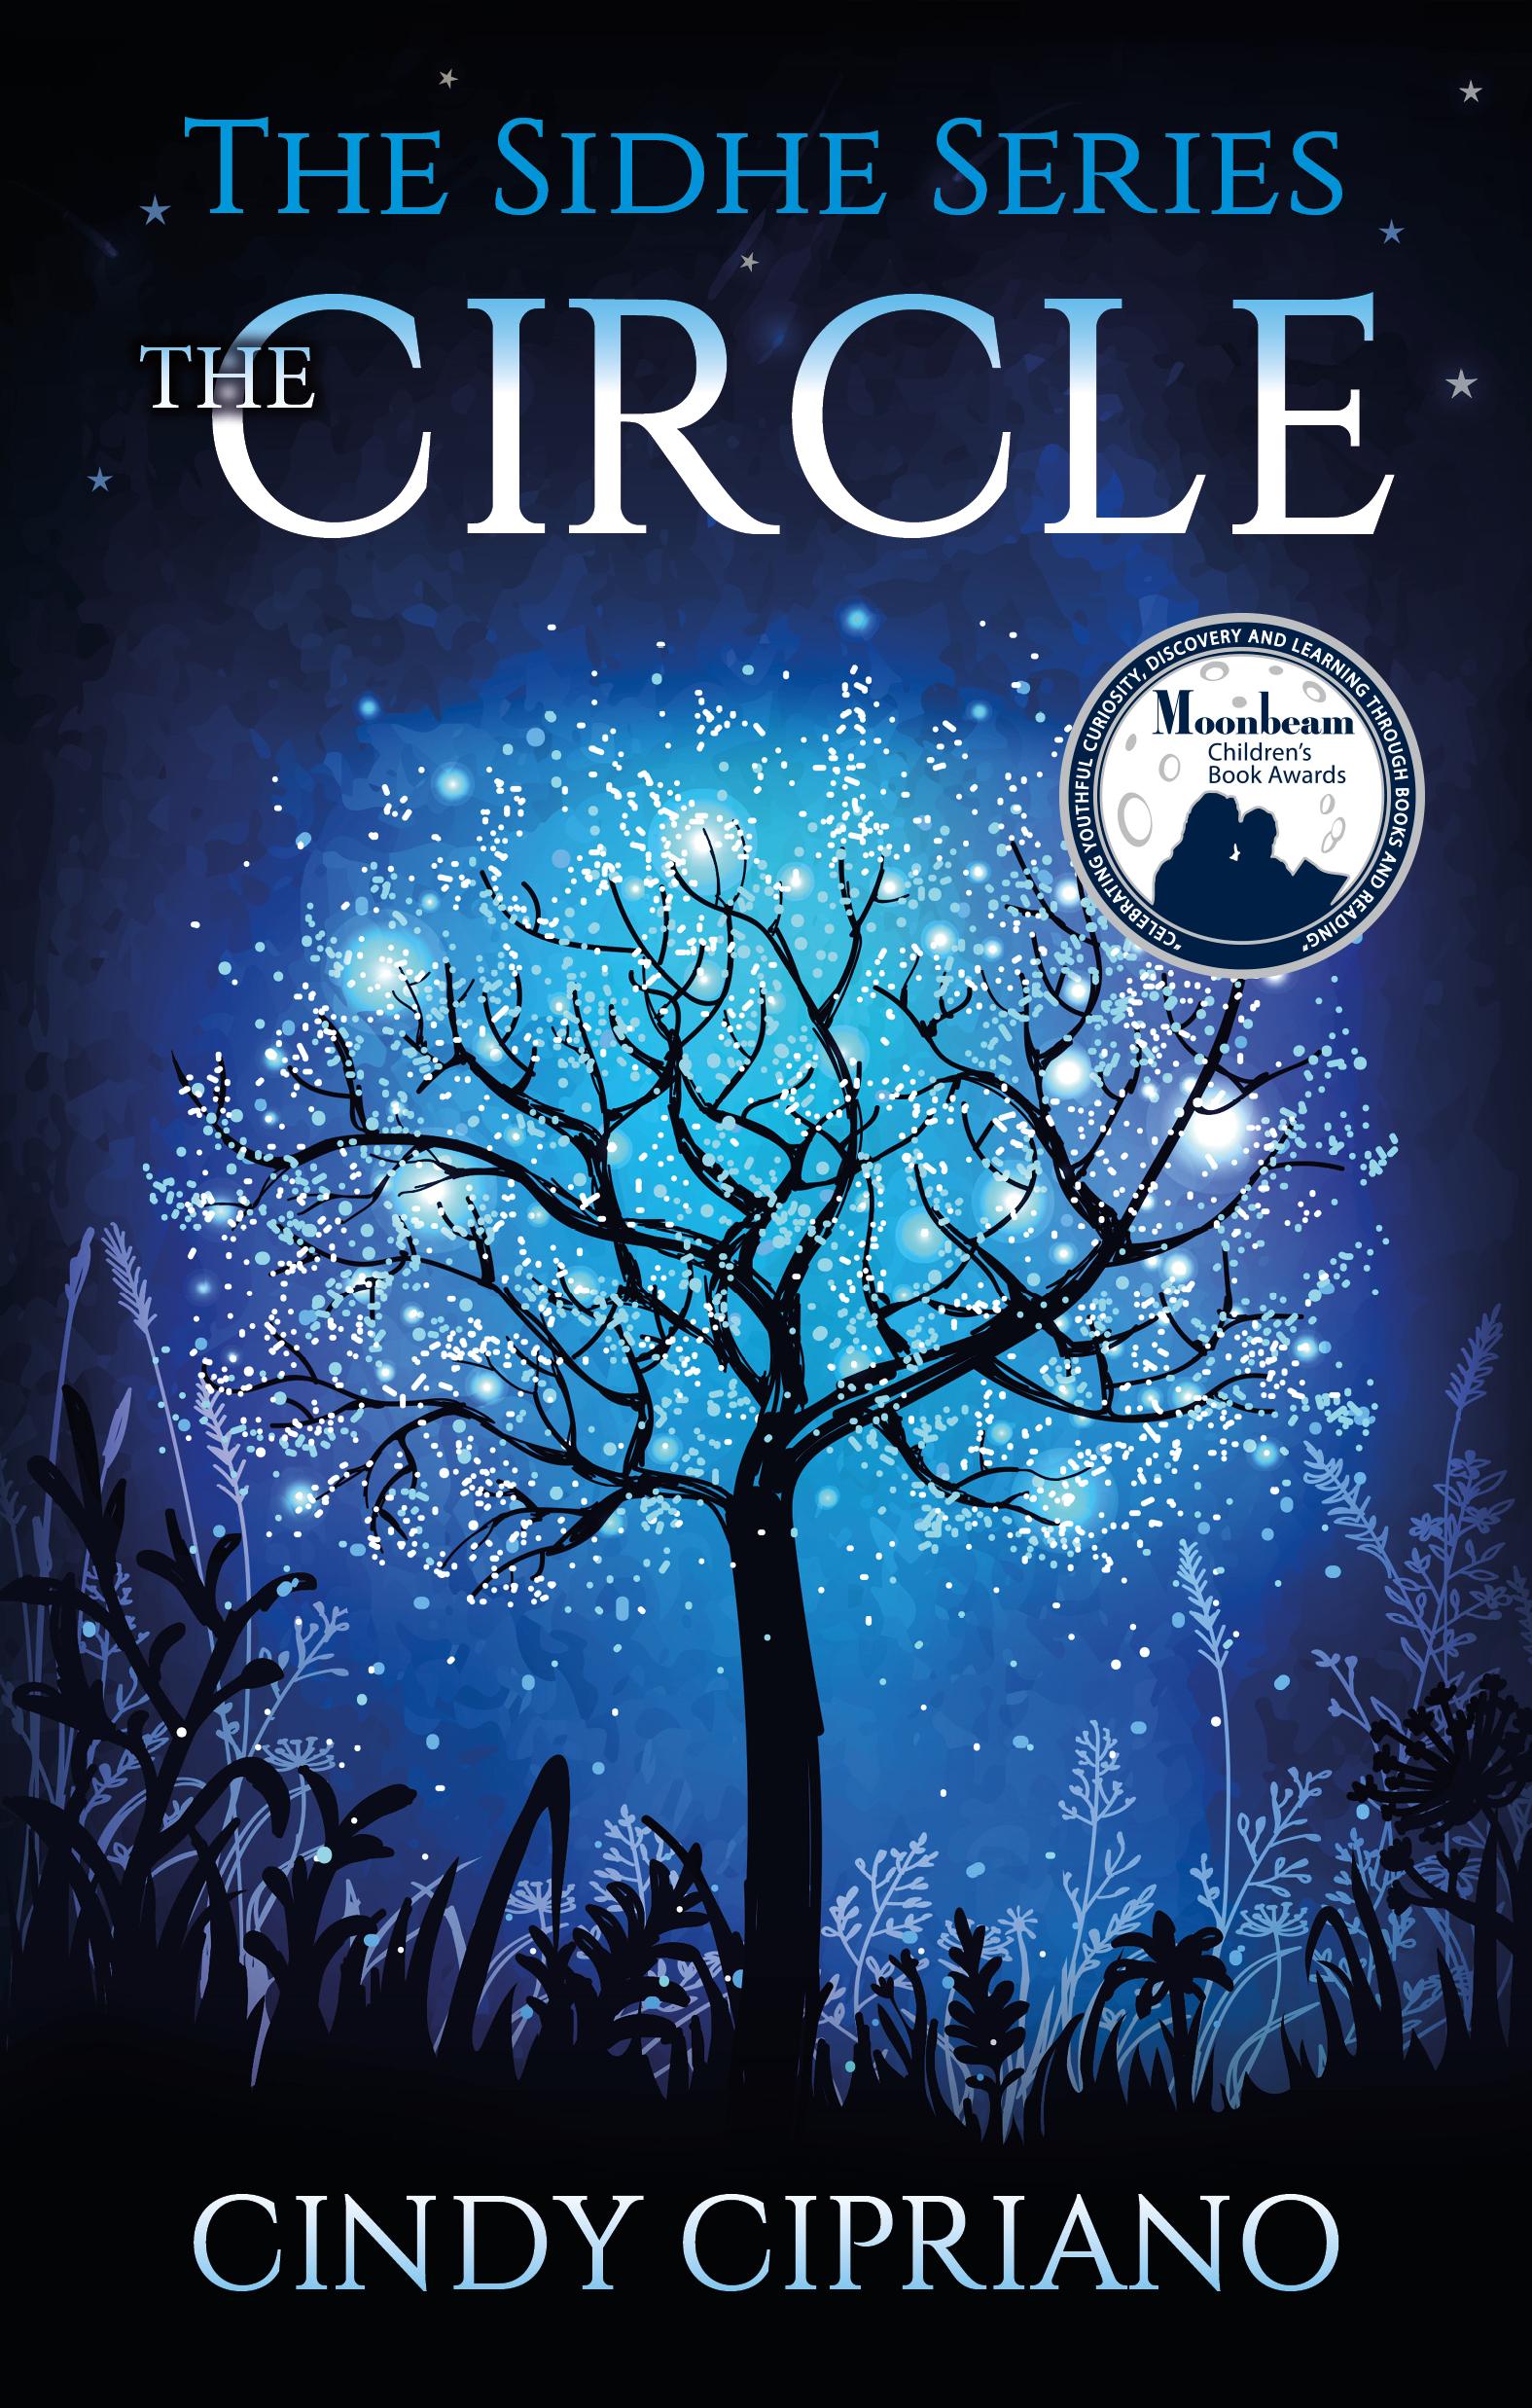 The Sidhe Series - The Circle - Ebook.jpg